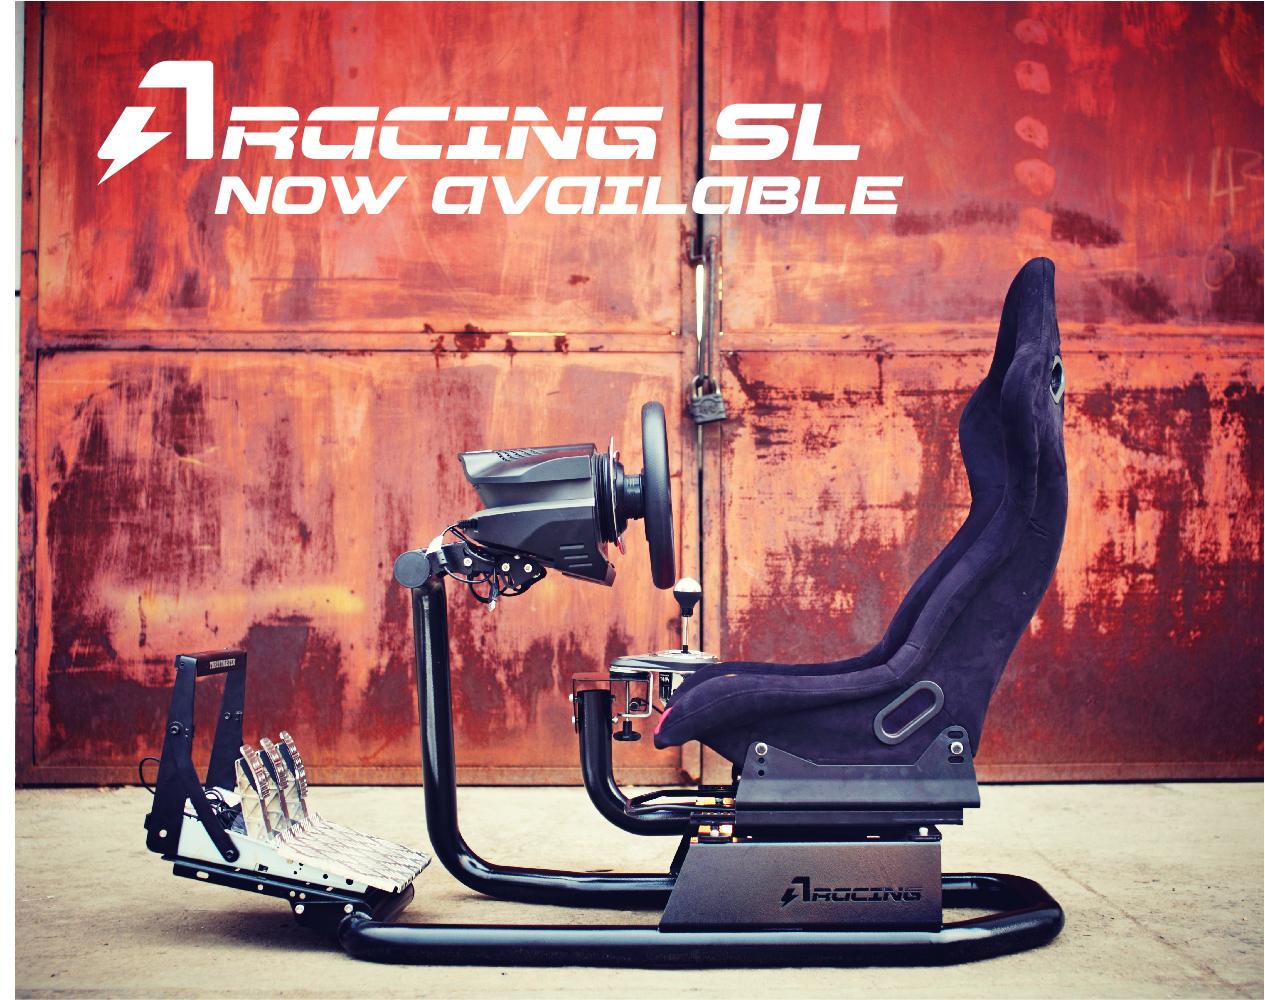 c4e315b0fc9 ... AZRACING simulation racing steering wheel bracket seat  T500/TX/T300/CSW/G29 ...